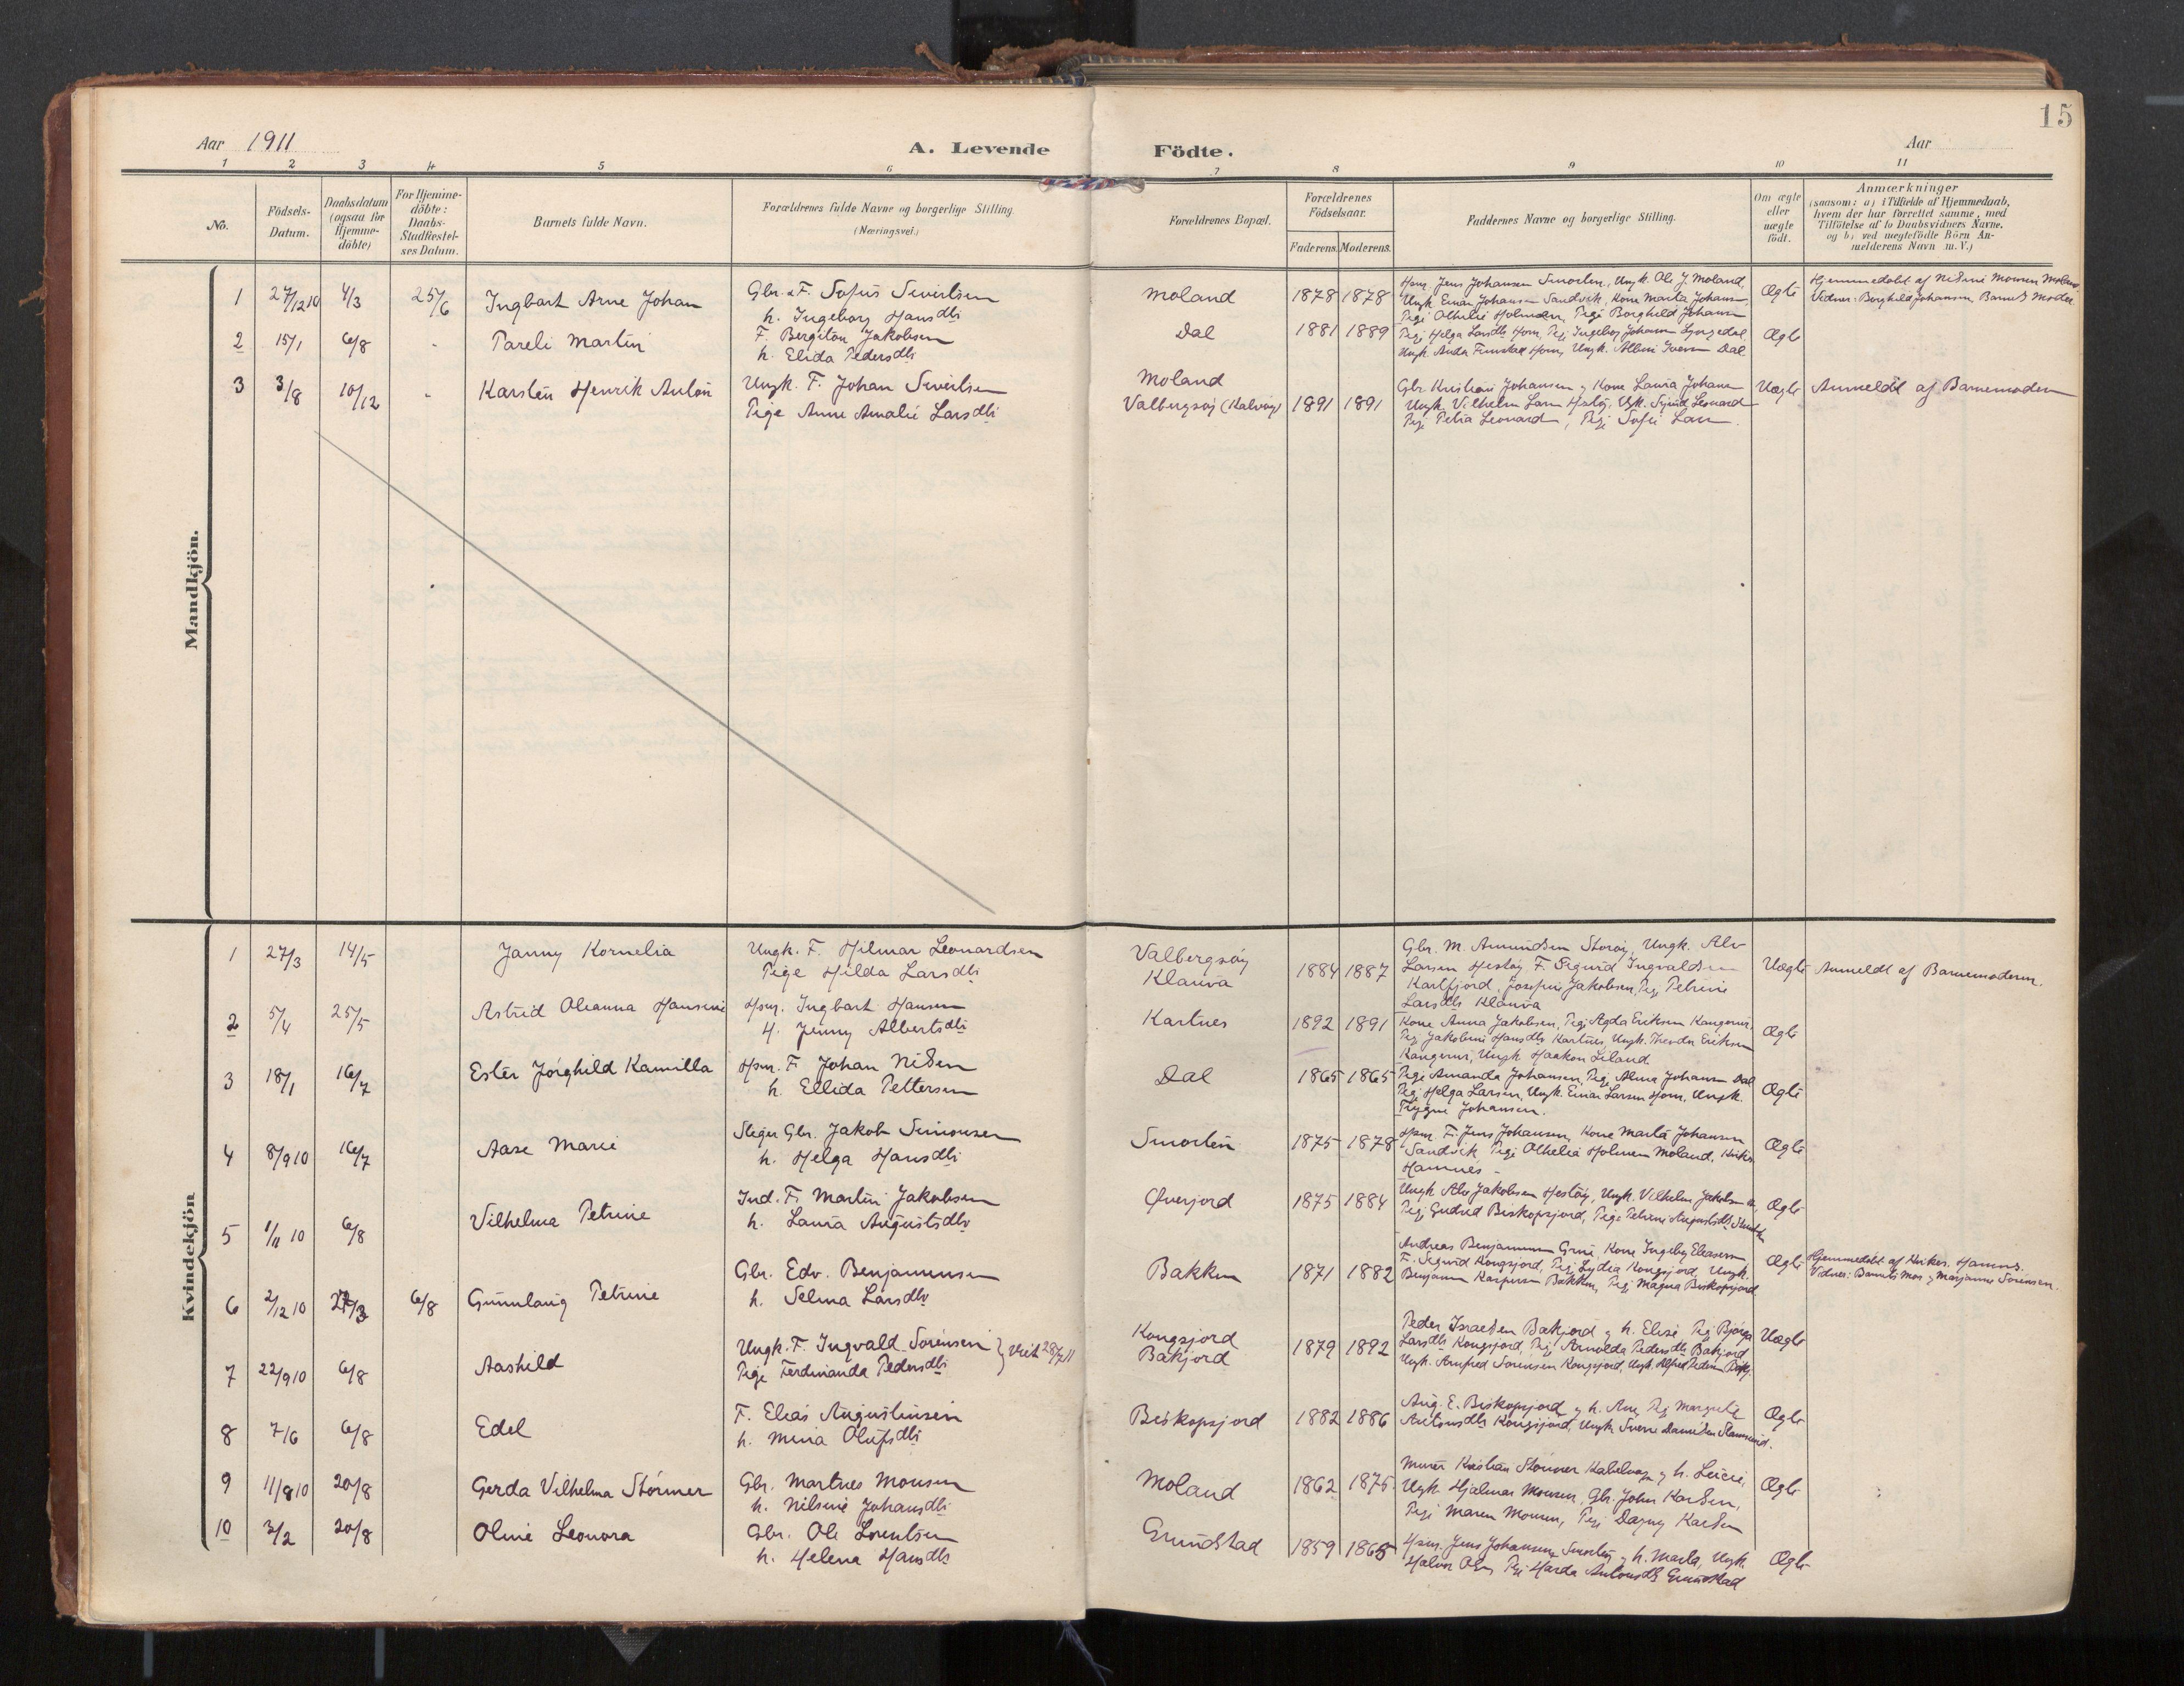 SAT, Ministerialprotokoller, klokkerbøker og fødselsregistre - Nordland, 884/L1194: Ministerialbok nr. 884A02, 1906-1937, s. 15